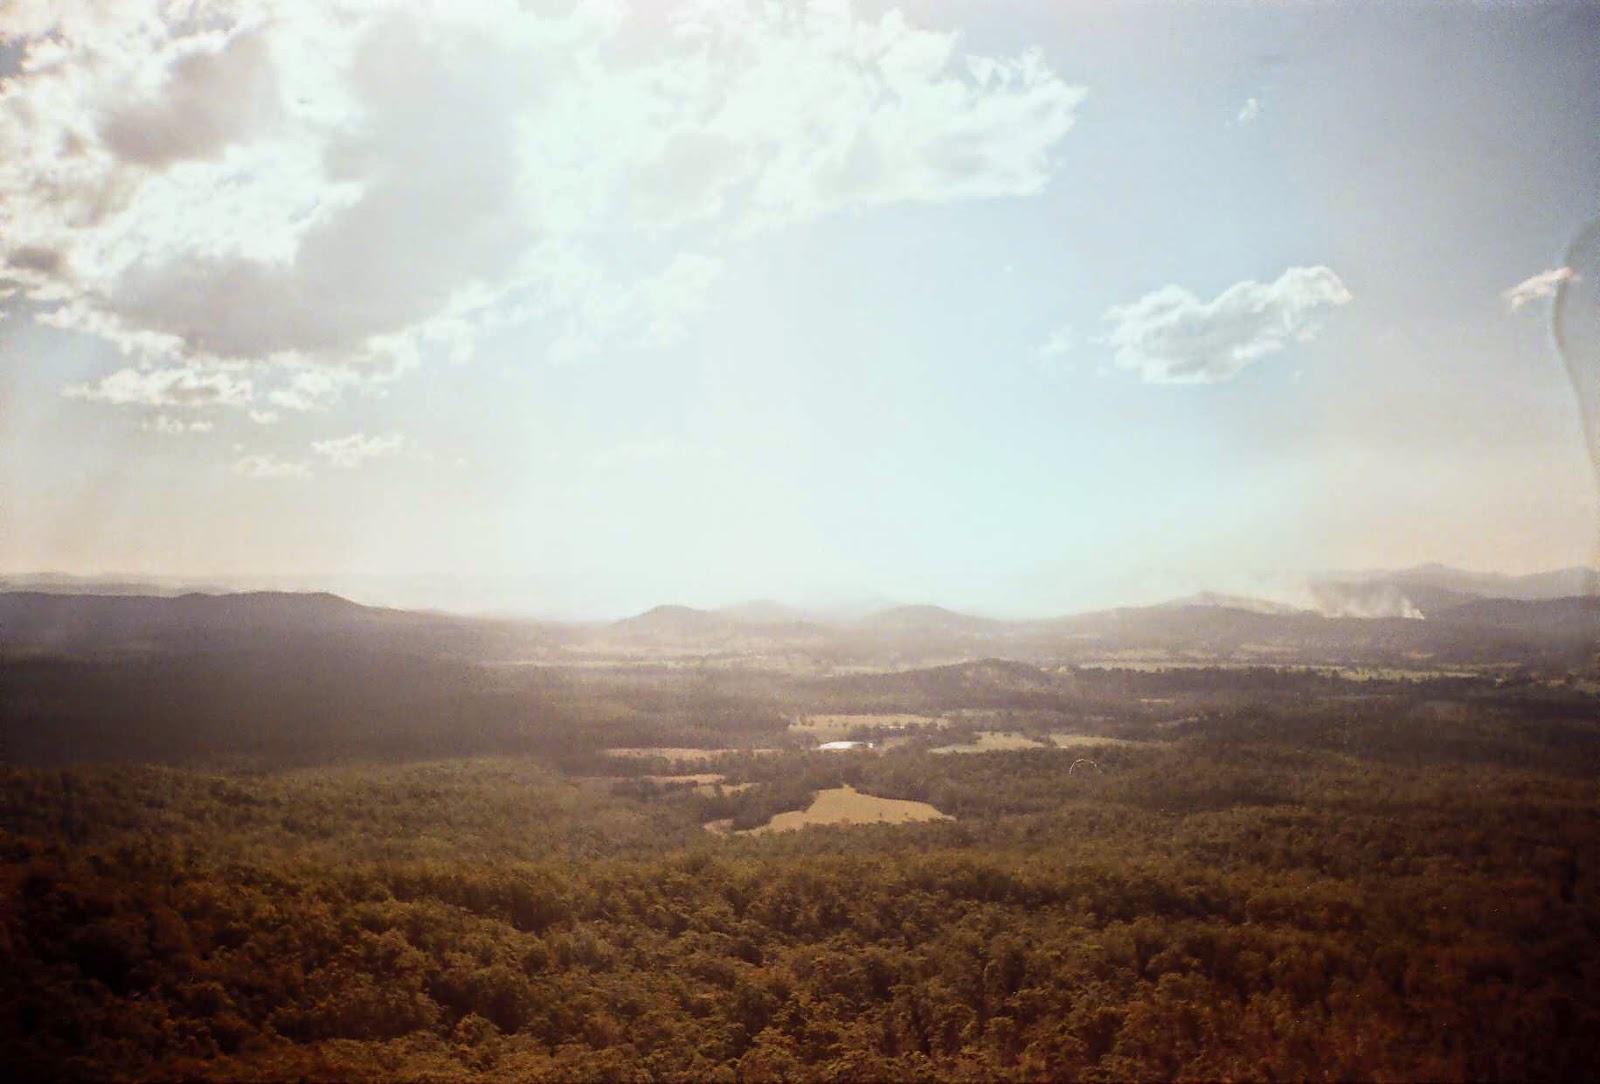 Bago Bluff National Park - liquisearch.com